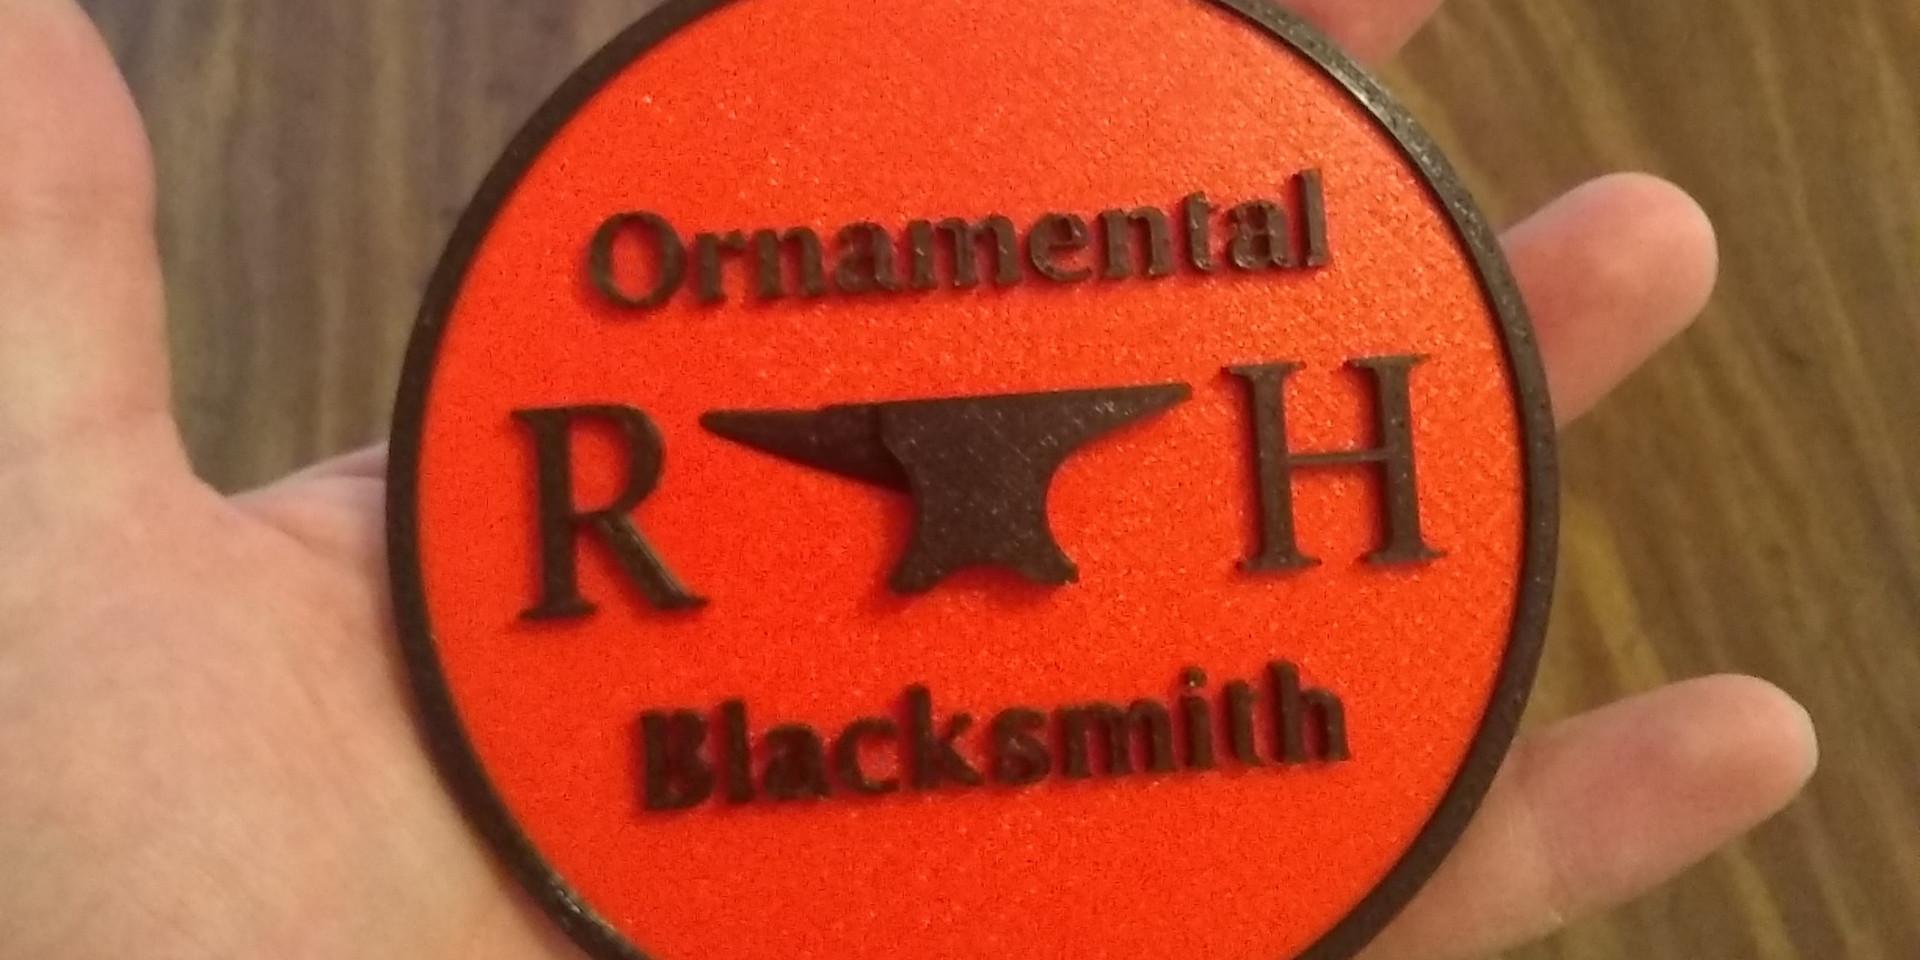 Blacksmith Christmas Ornament